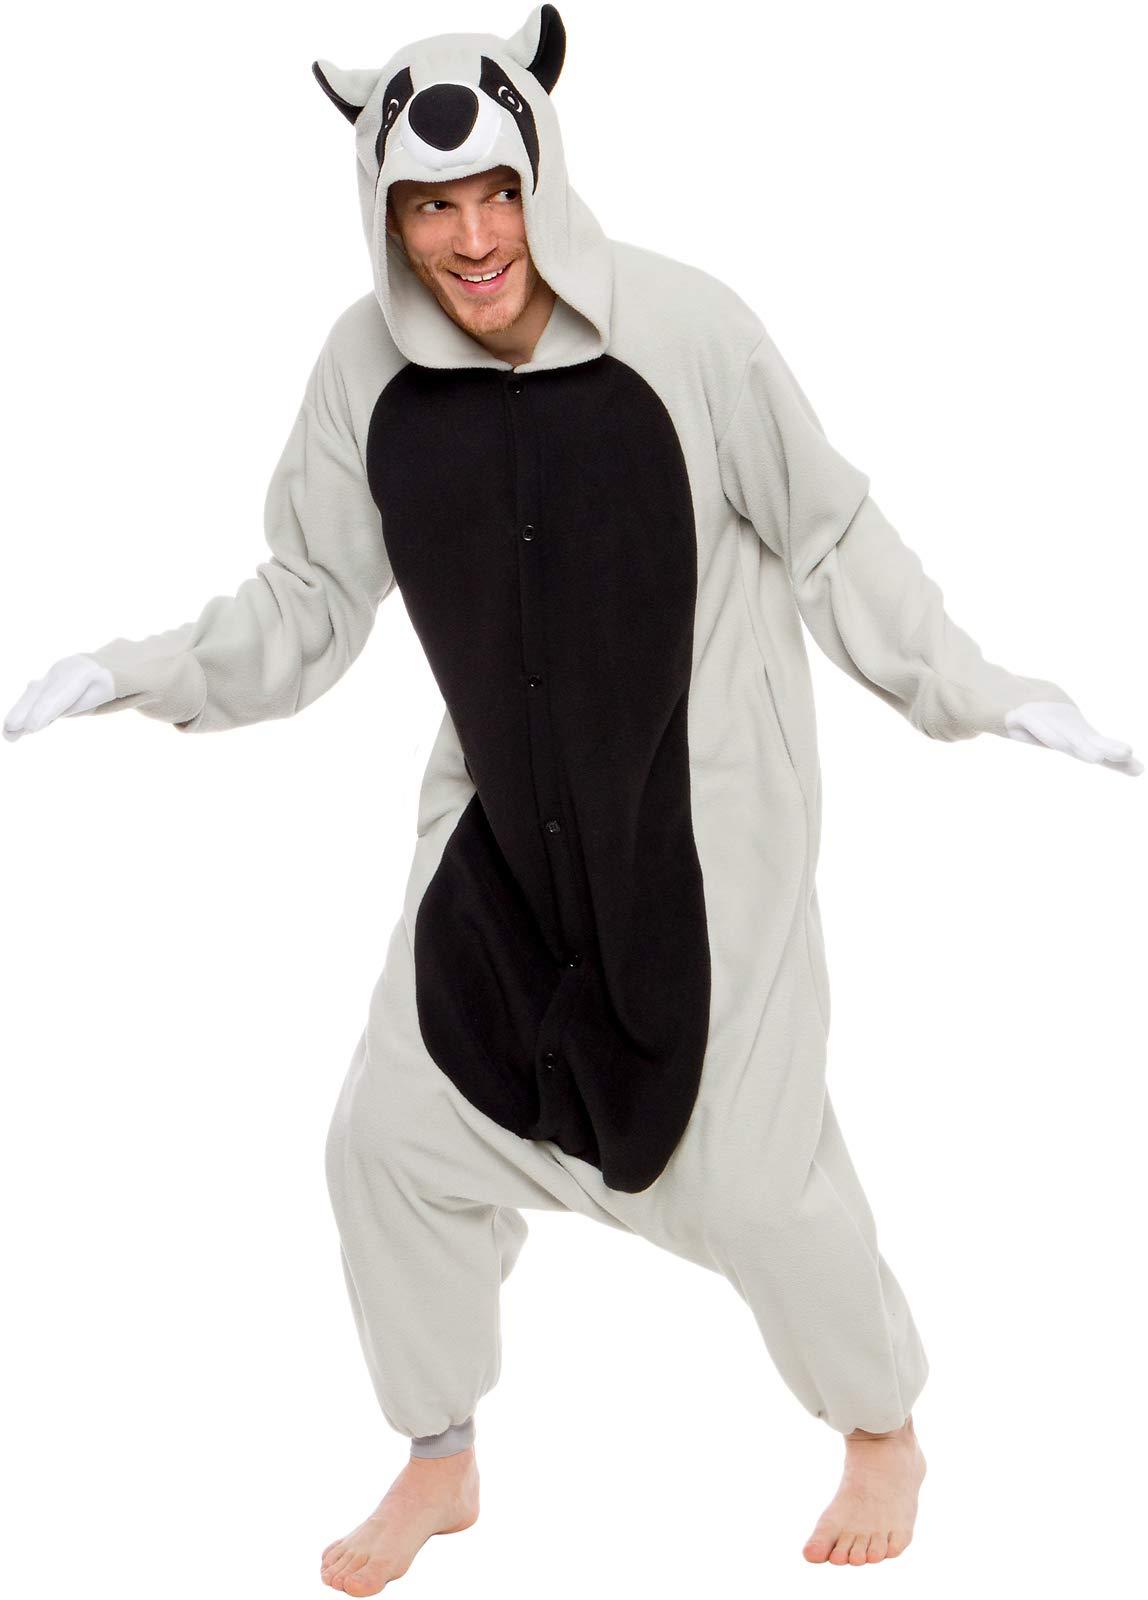 Silver Lilly Unisex Adult Pajamas - Plush One Piece Cosplay Animal Raccoon Costume